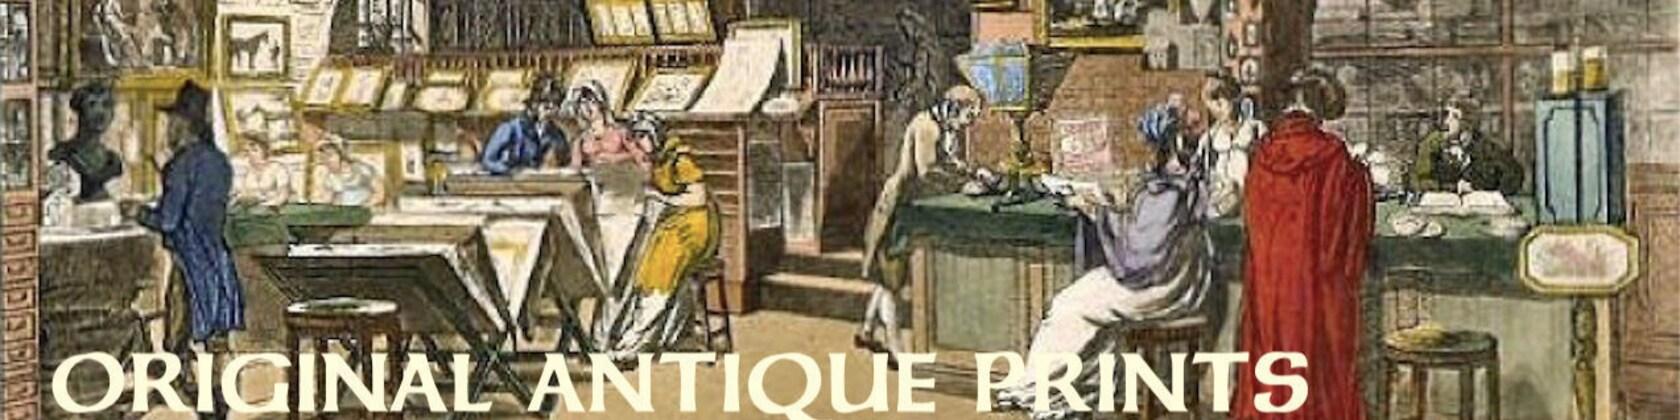 ANTIQUE ENGRAVINGS & LITHOGRAPHS 16th to por antiqueprintstore